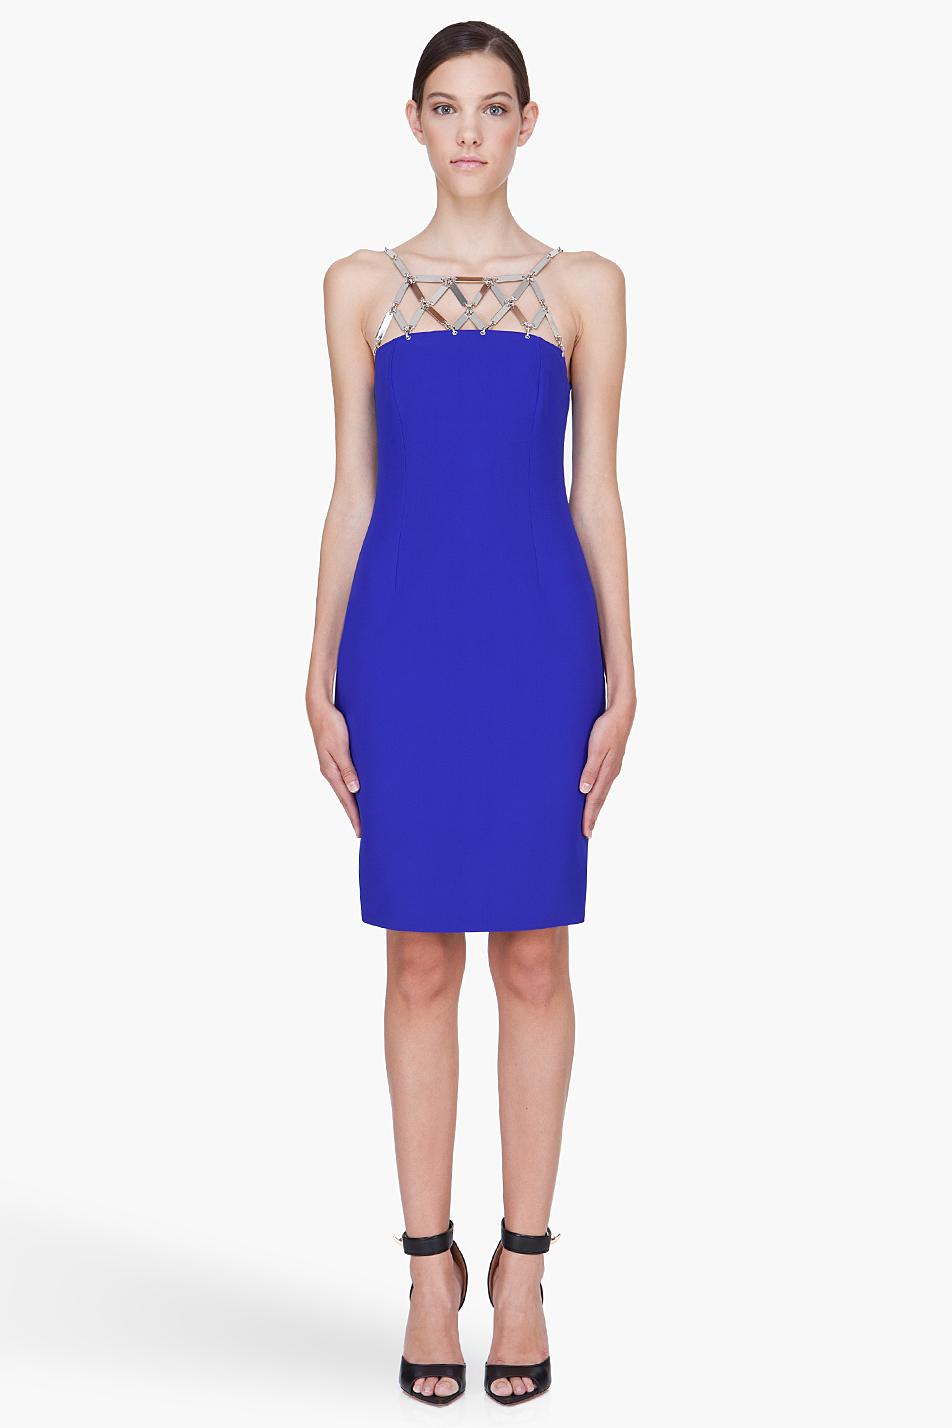 Silk Cocktail Dress Cocktail Dresses 2016